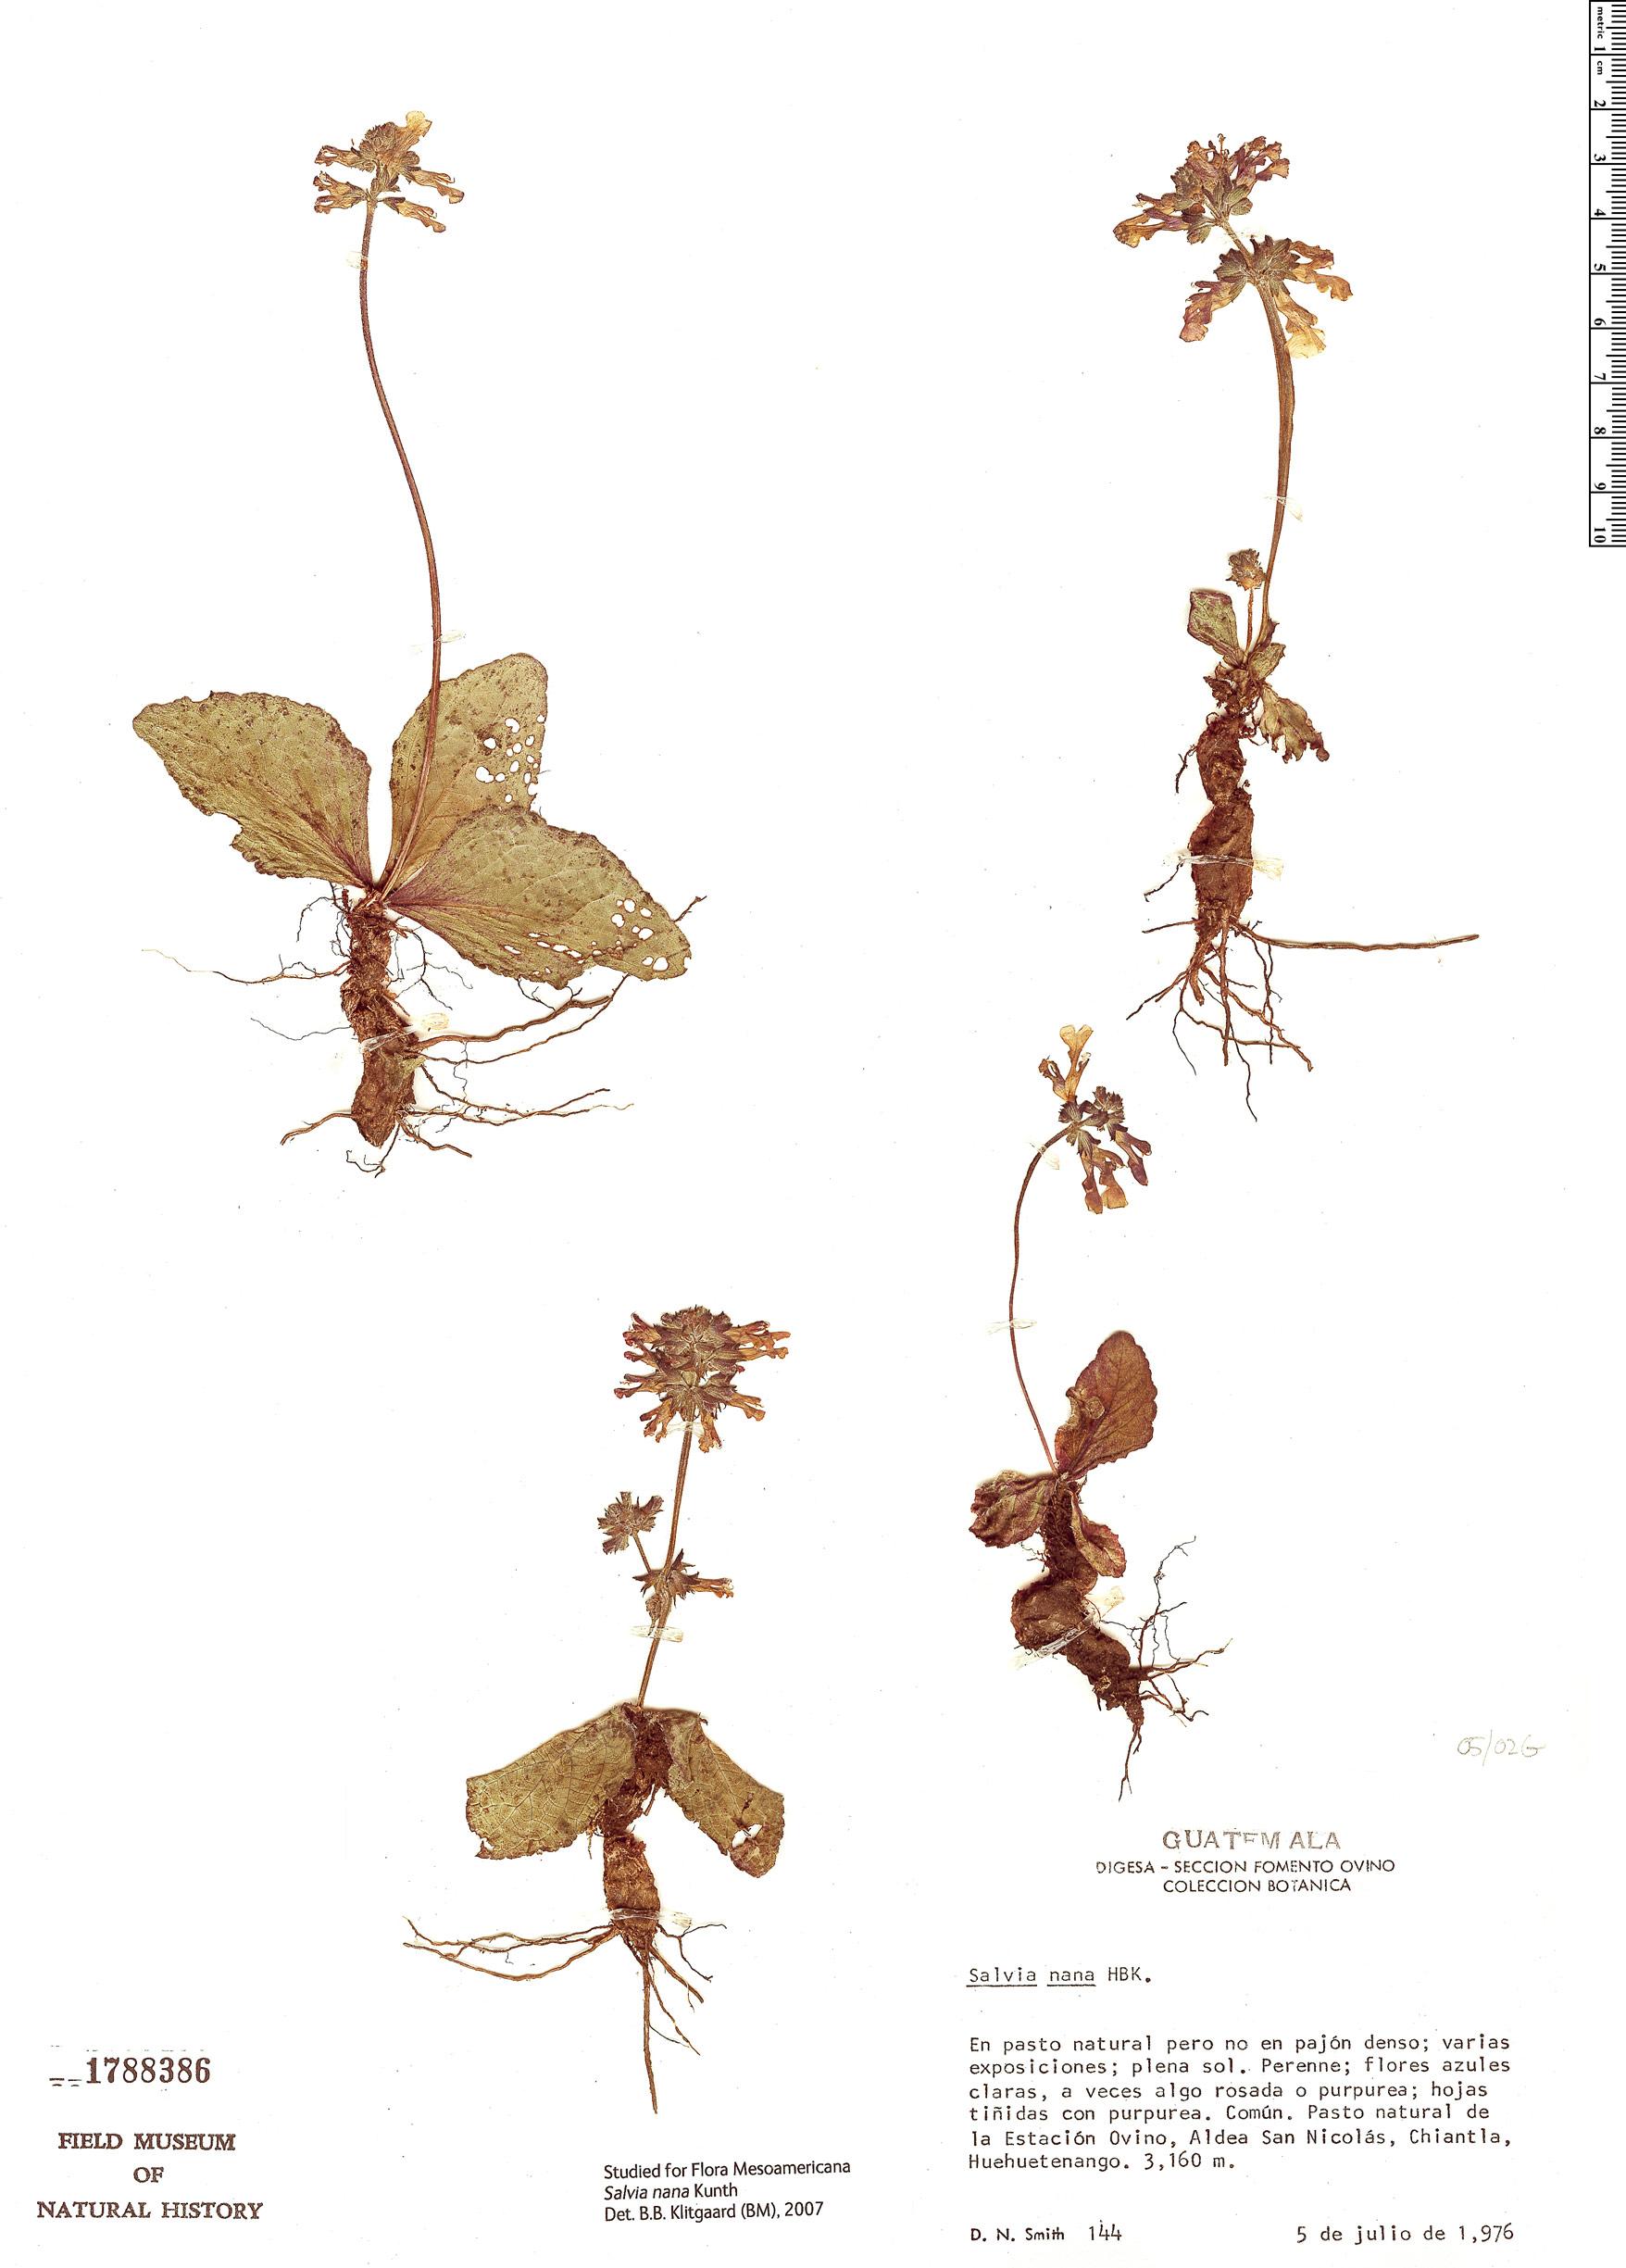 Specimen: Salvia nana